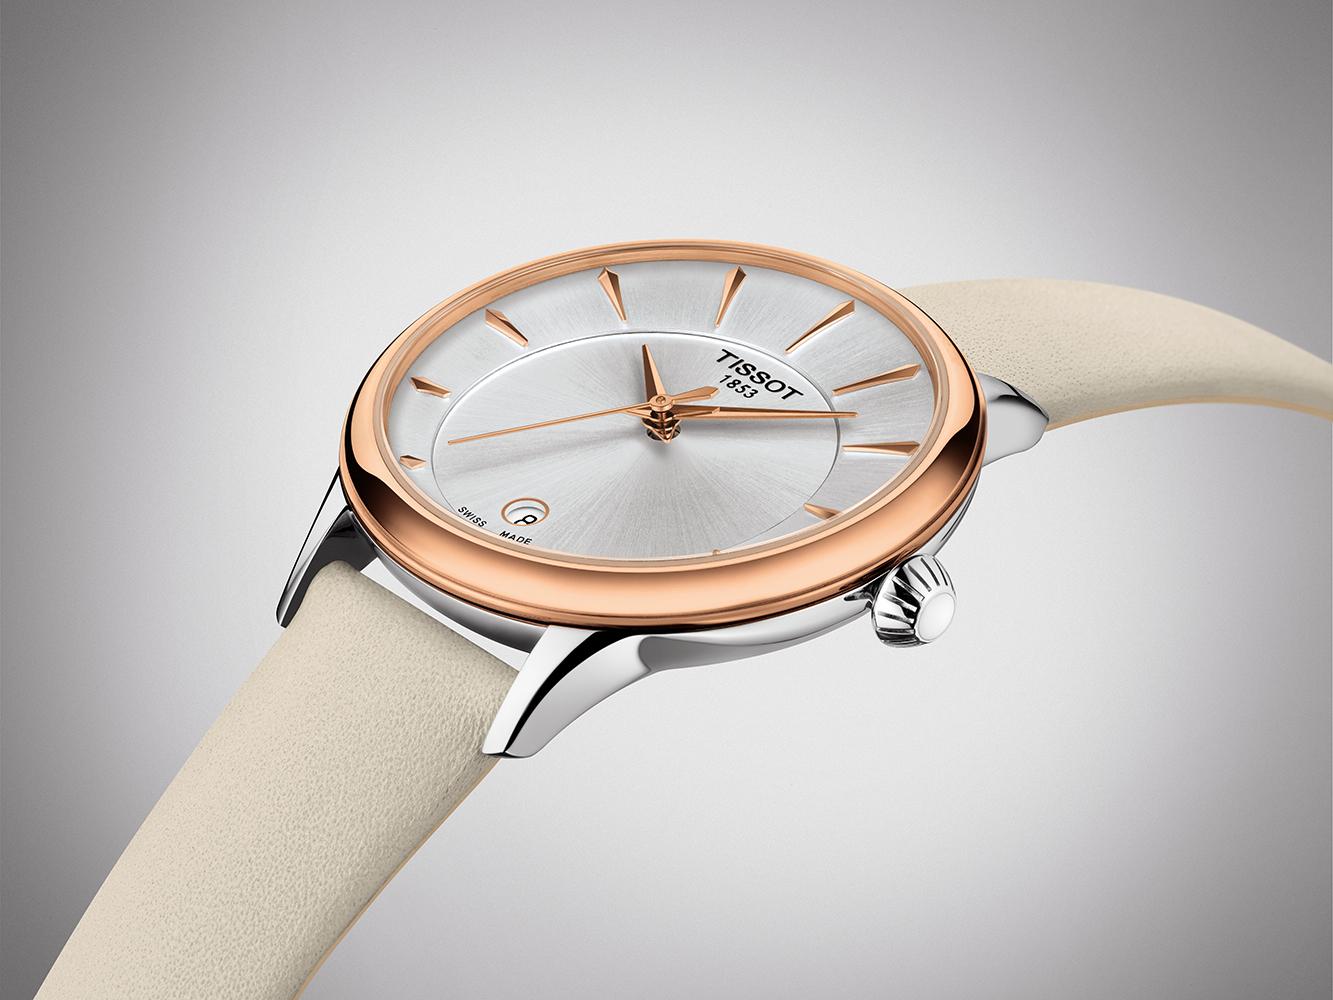 Tissot T133.210.26.031.00 zegarek różowe złoto elegancki Odaci-T pasek